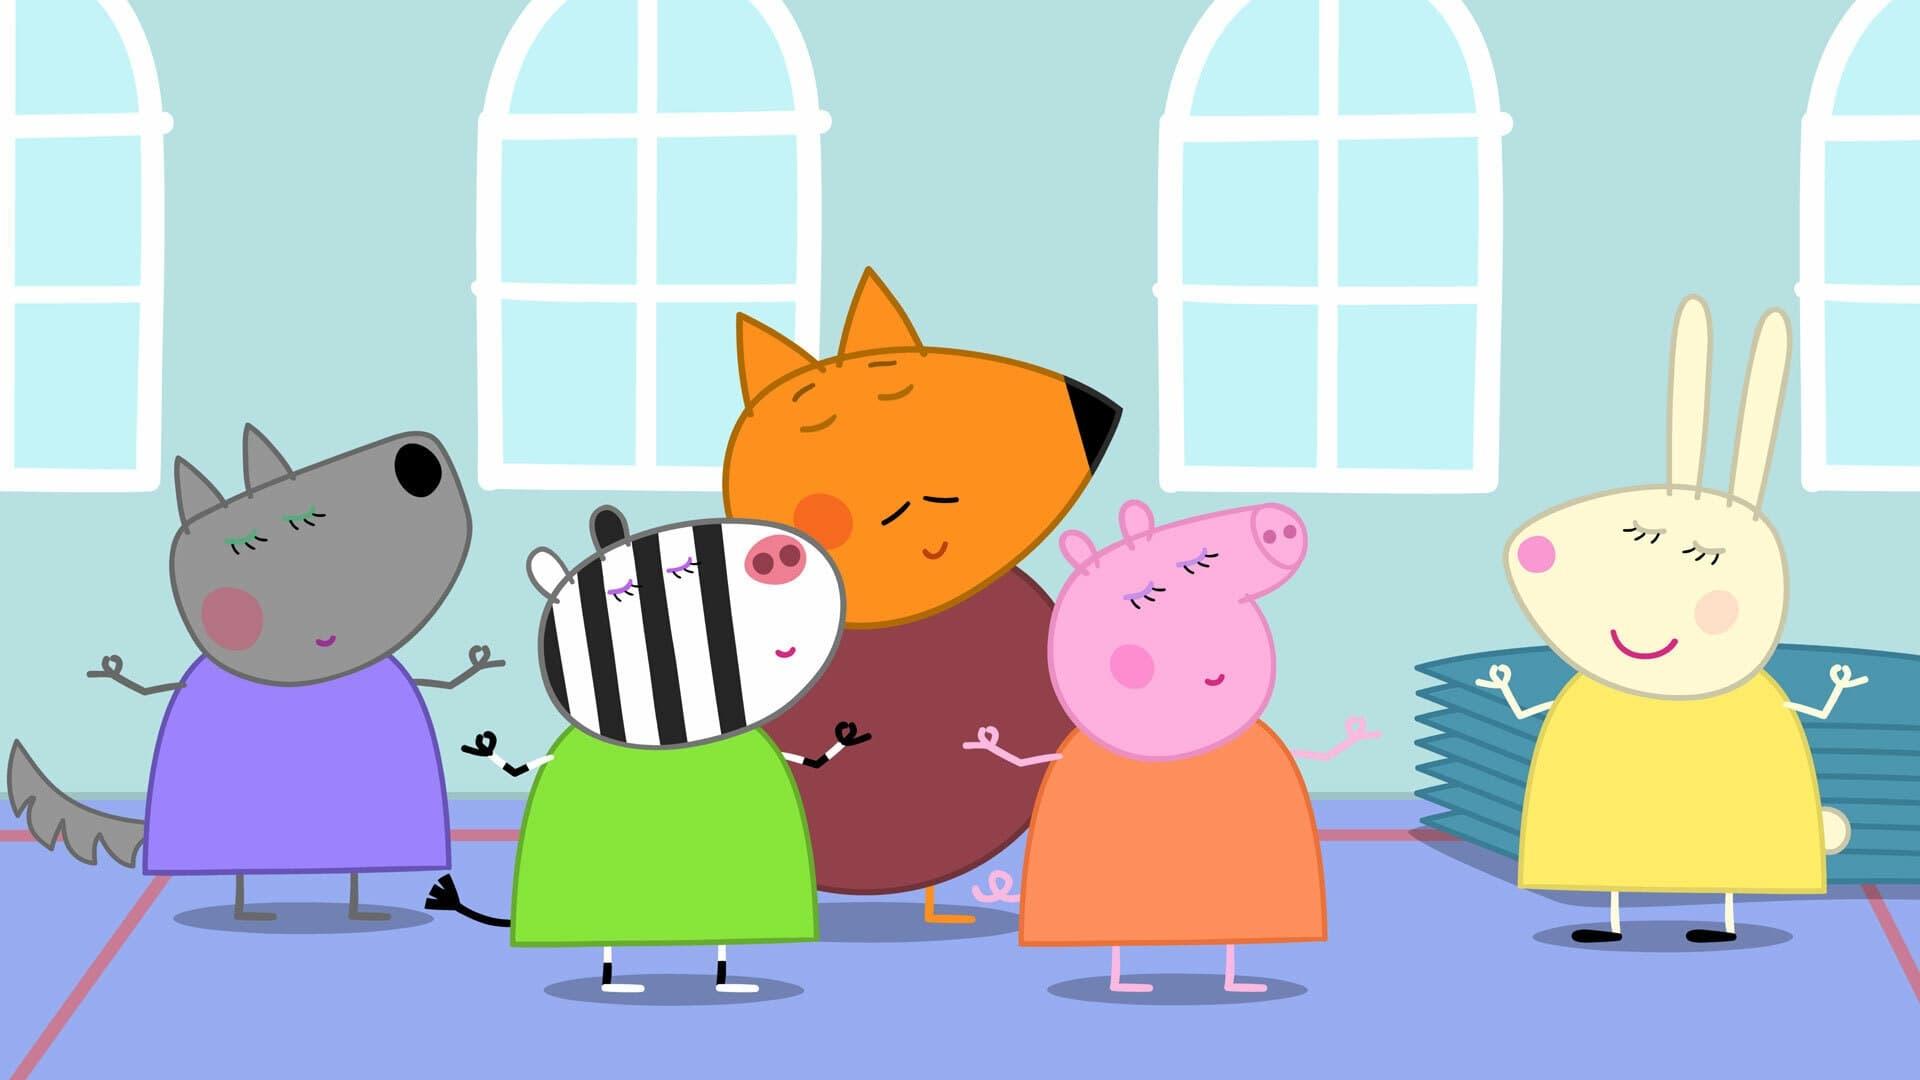 Peppa Pig Season 6 :Episode 5  Miss Rabbit's Relaxation Class